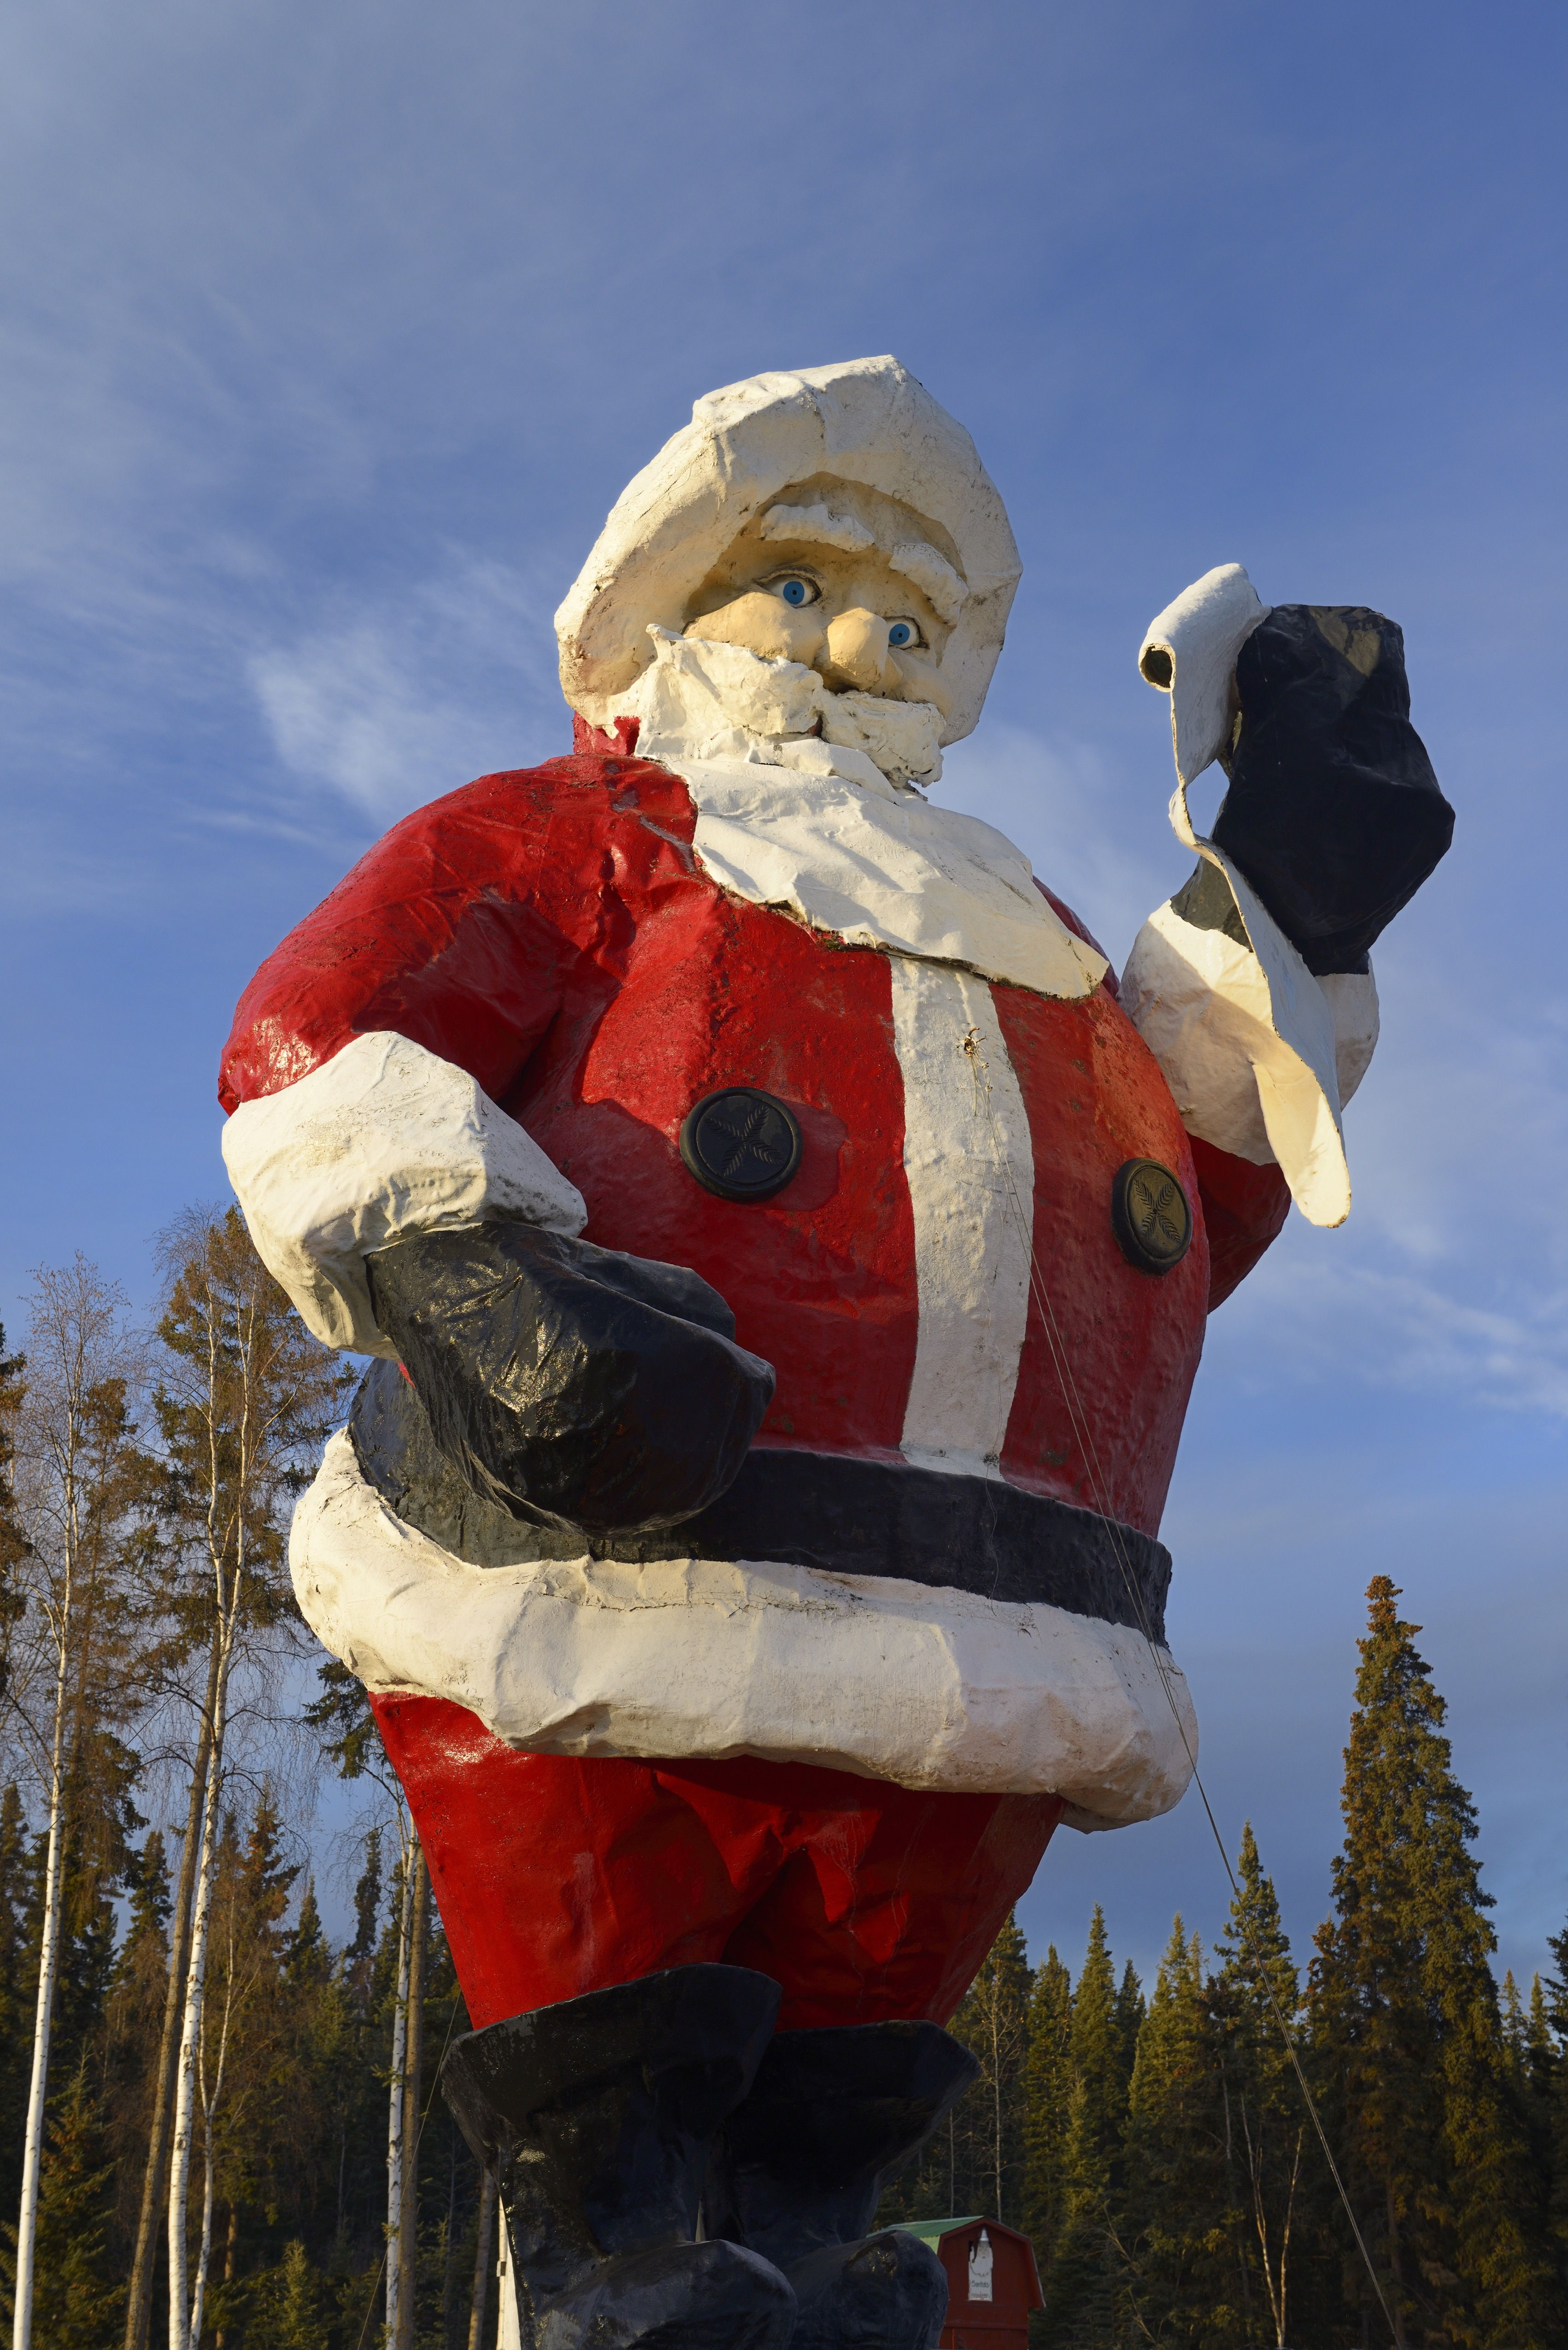 gigantisk julenissestatue ved santaland i nordpolen alaska